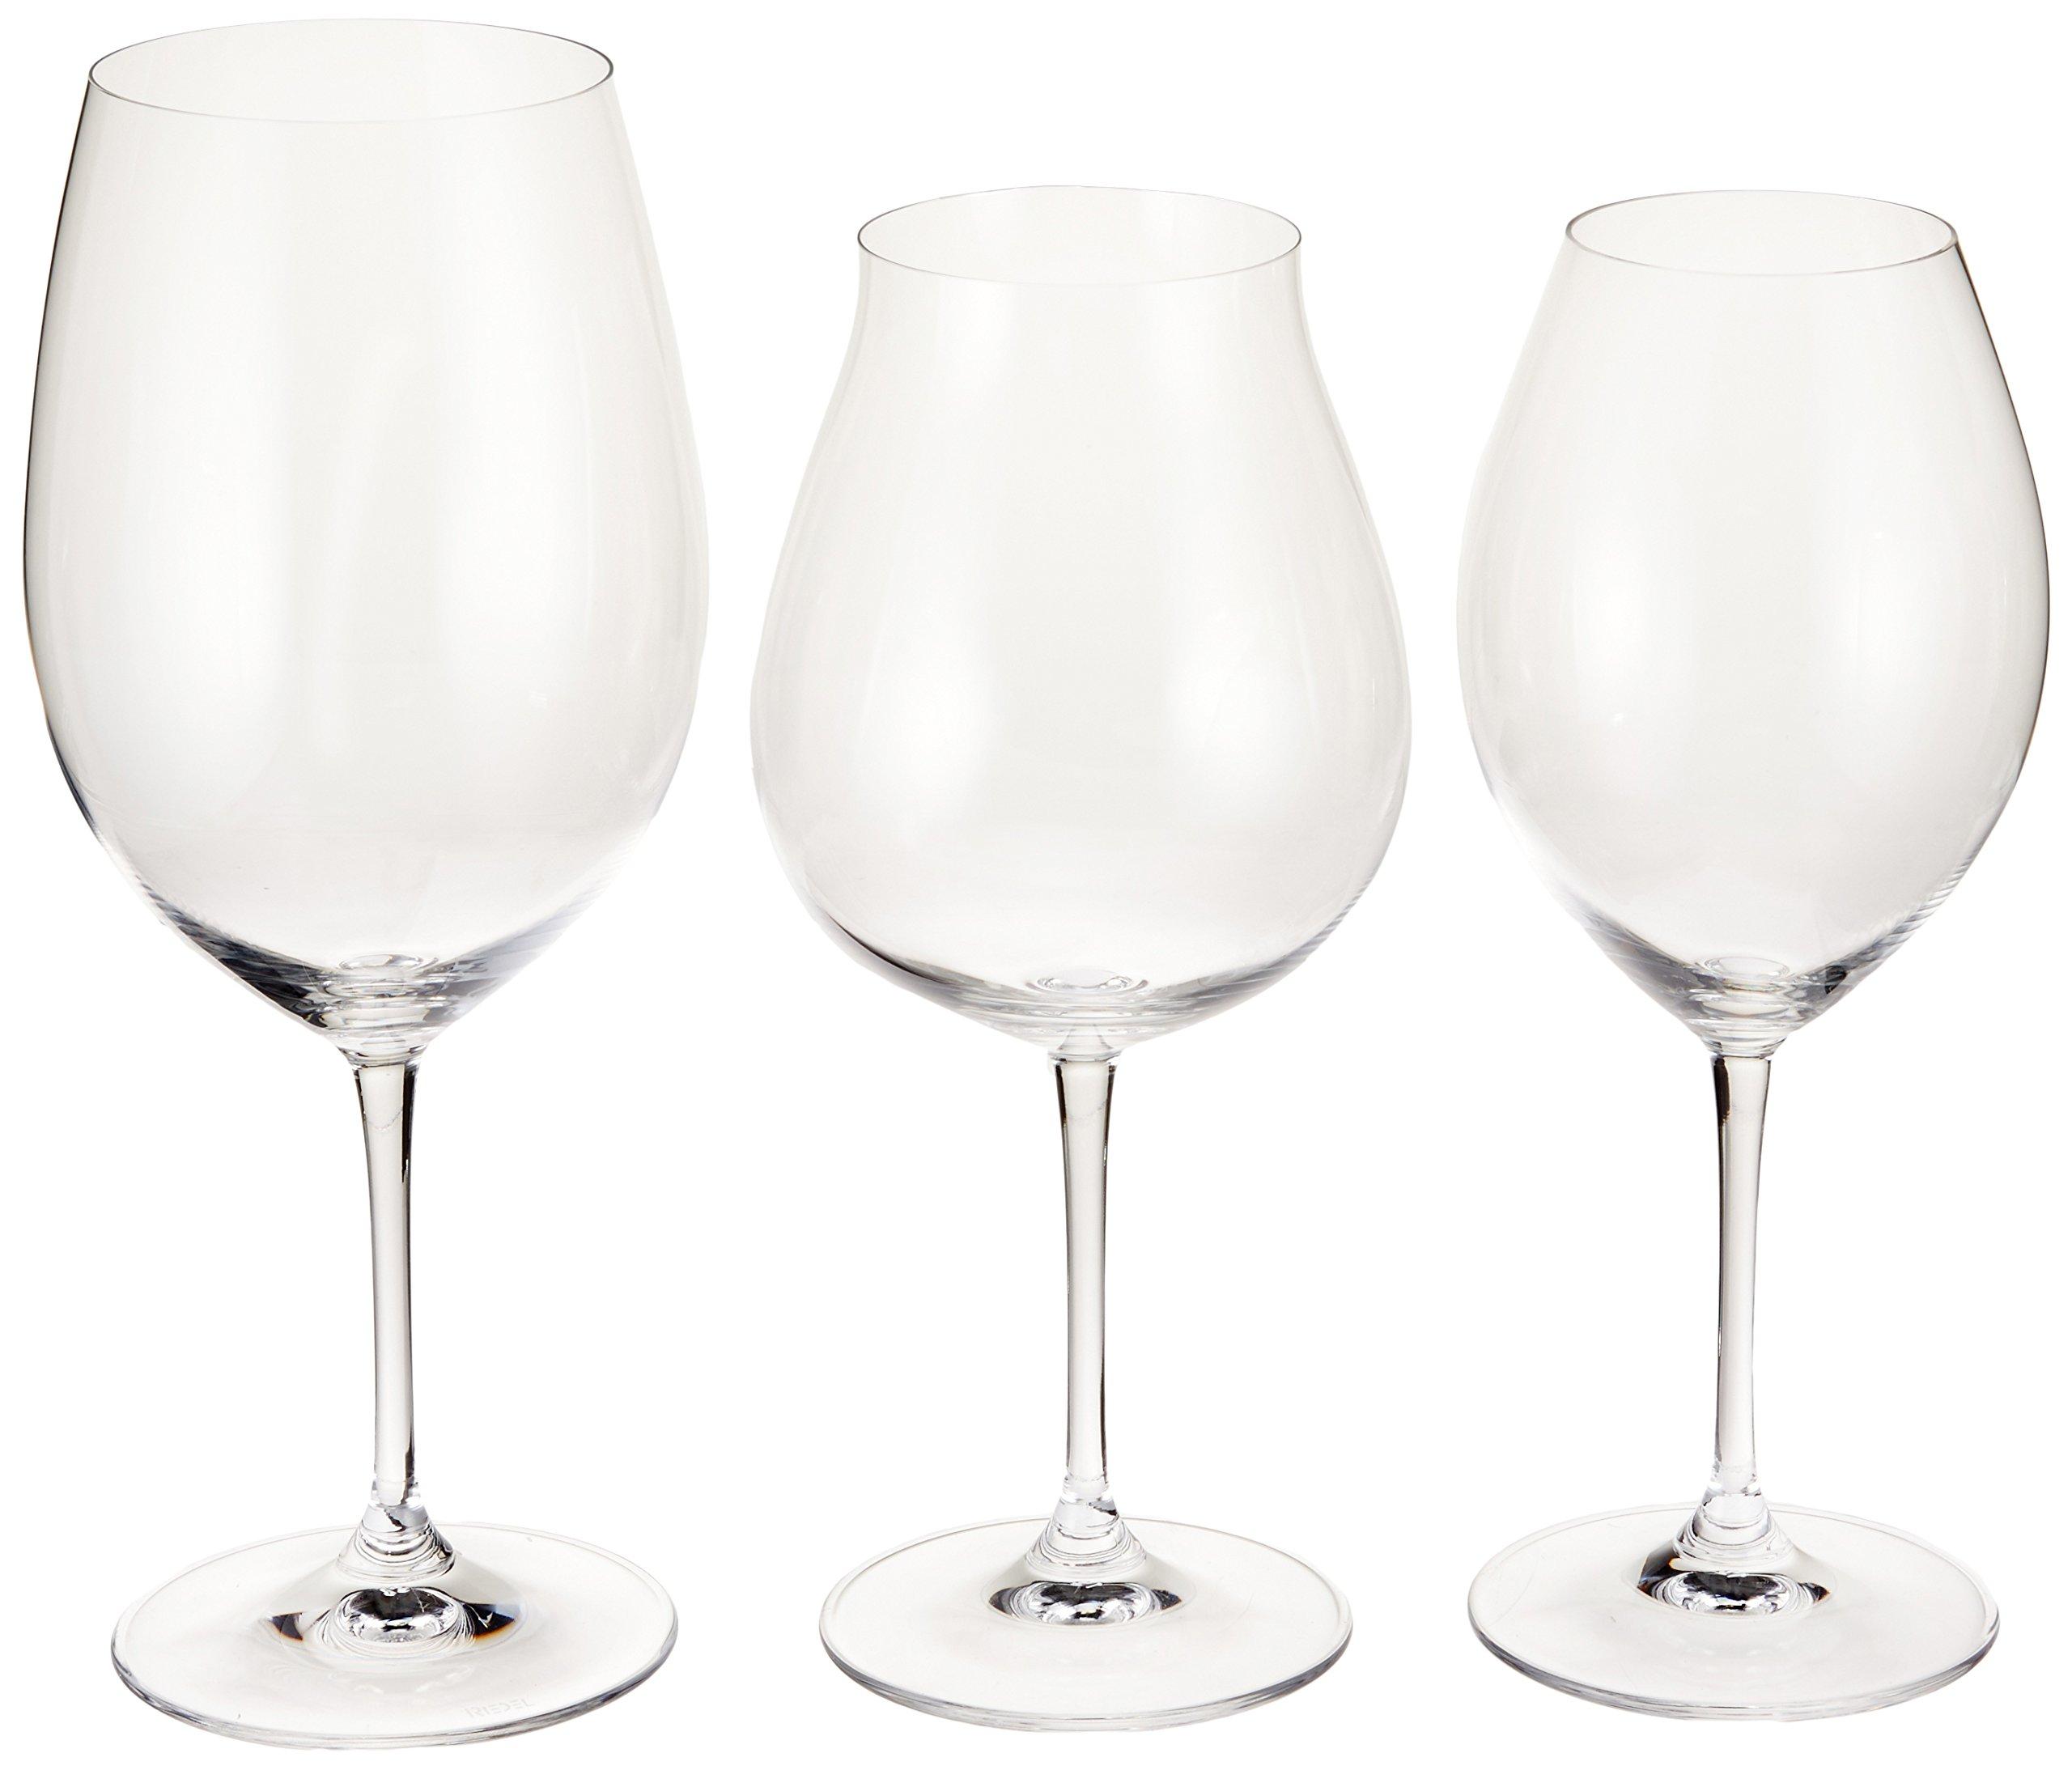 Riedel VVE-035 Vinum Red Wine Tasting Set (3 Piece), X-Large, Clear